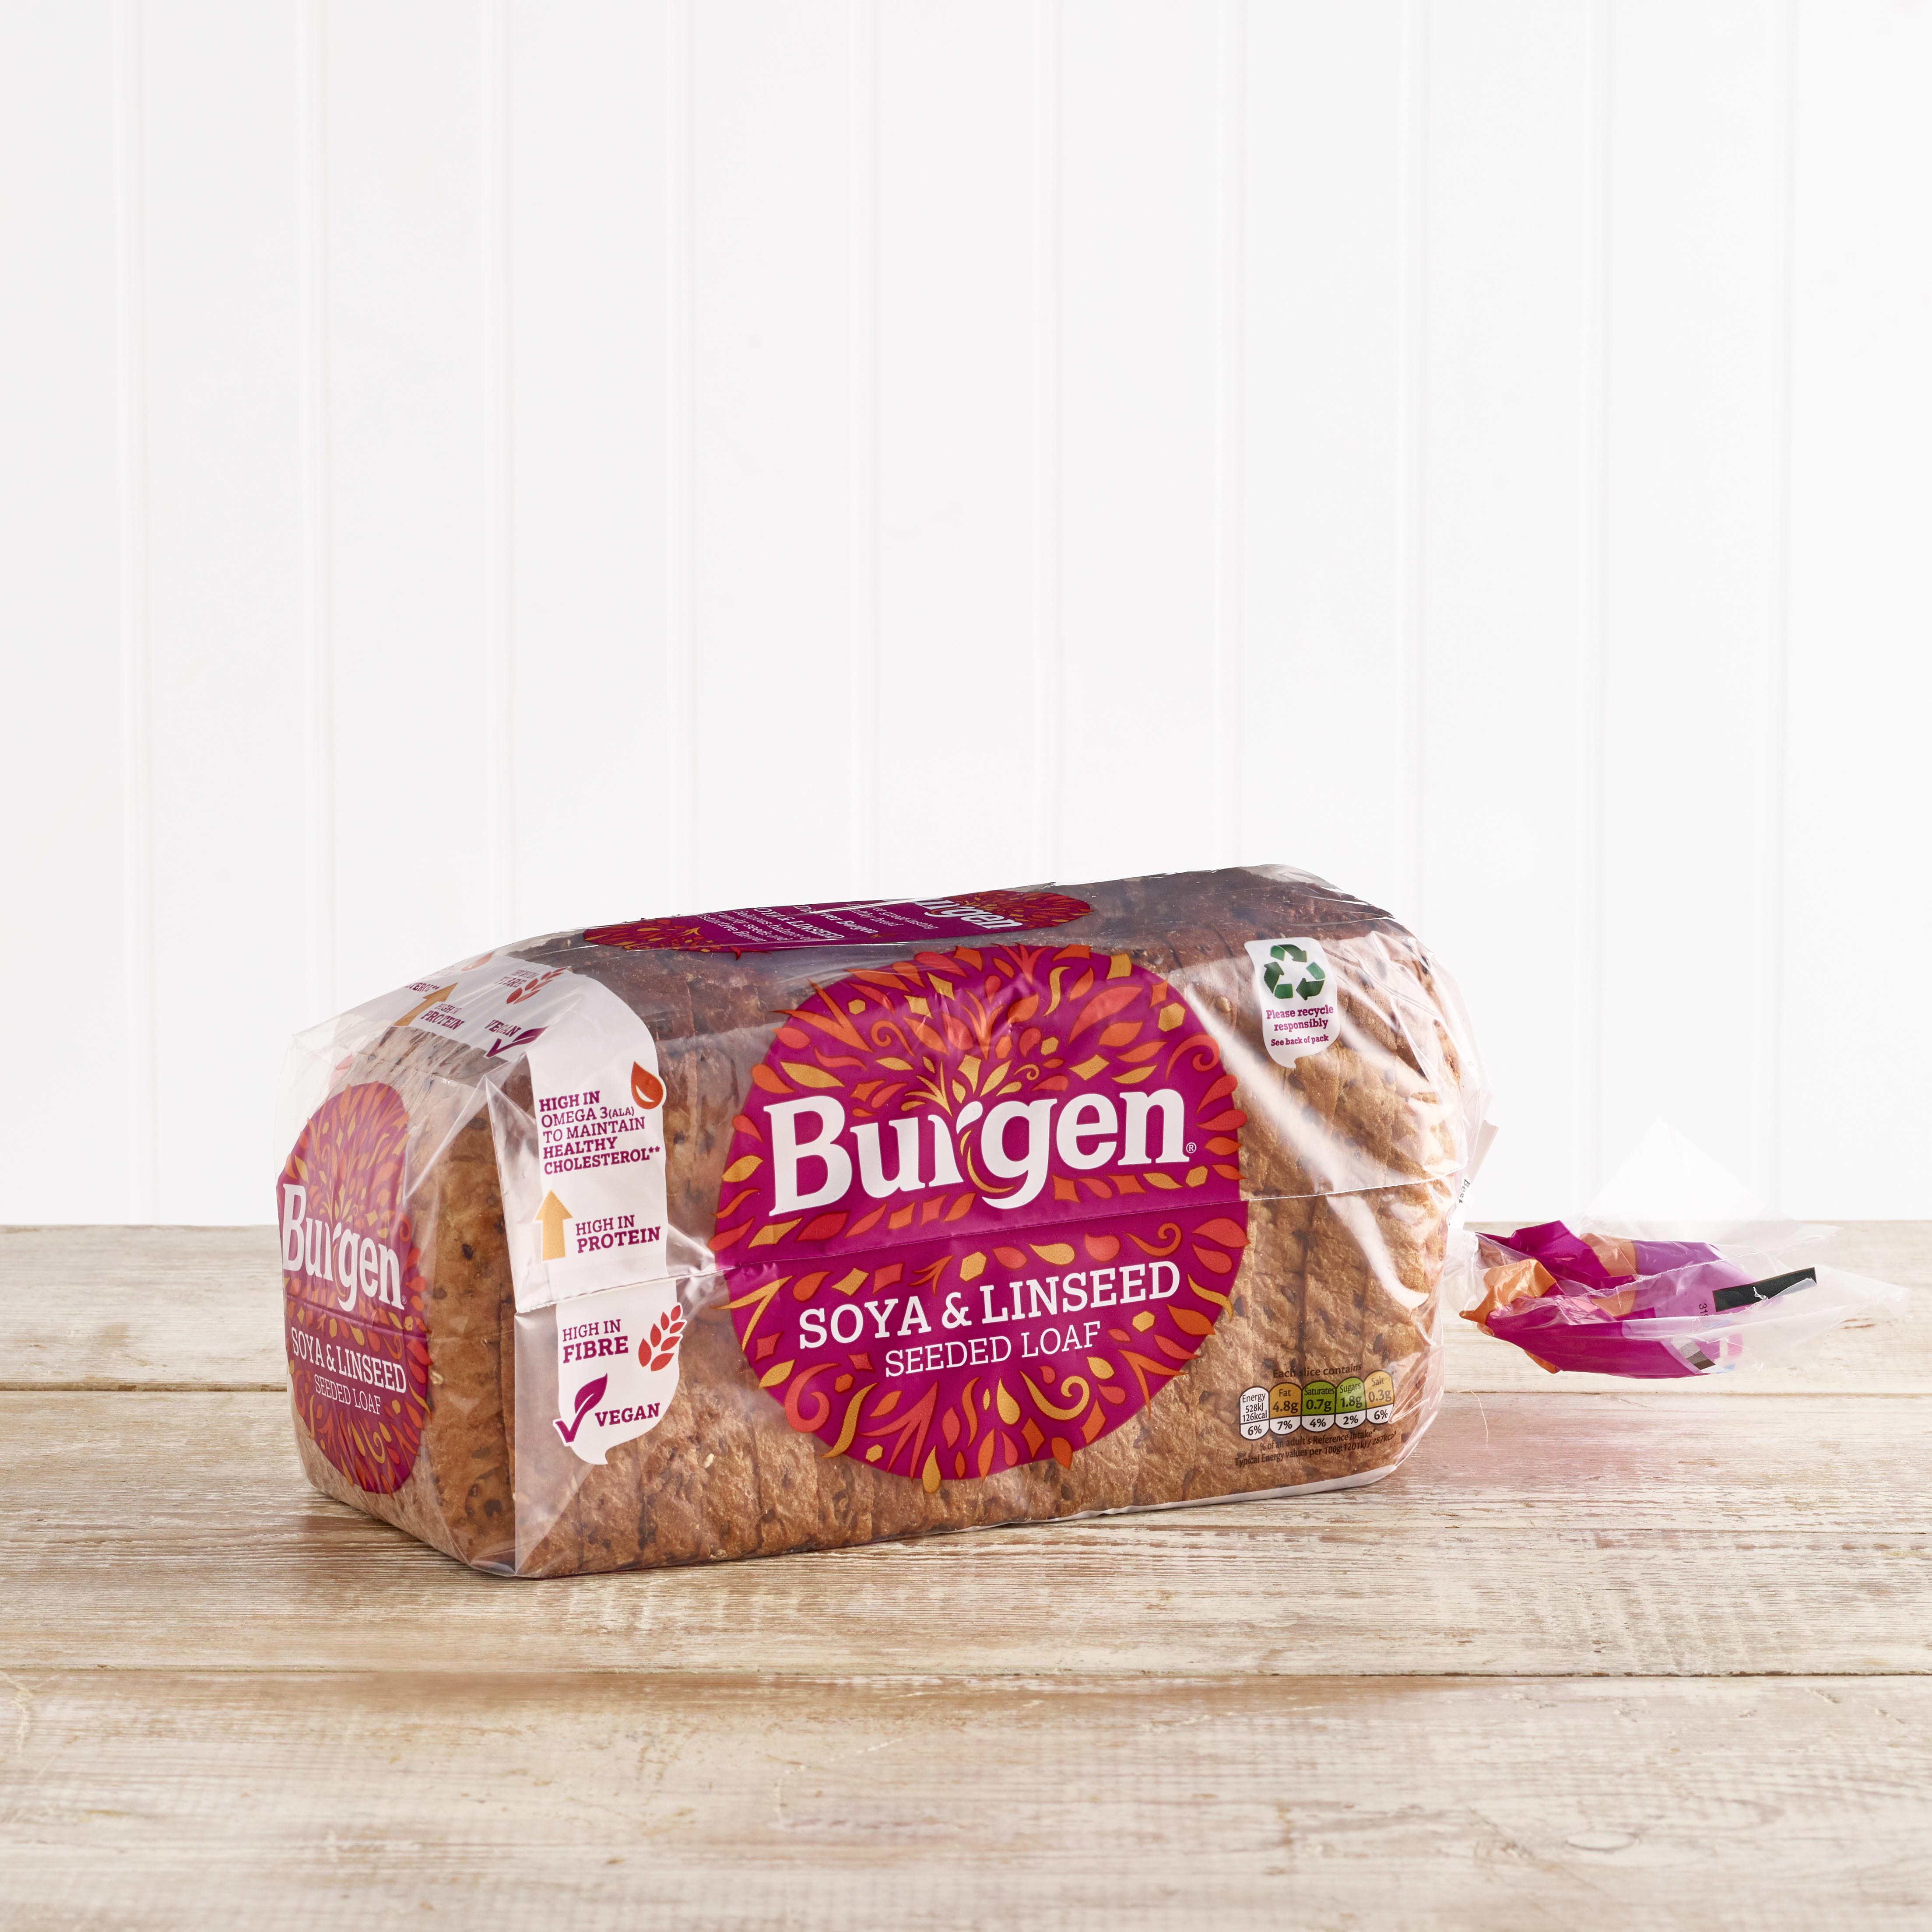 Burgen Soya & Linseed Seeded Loaf, 800g